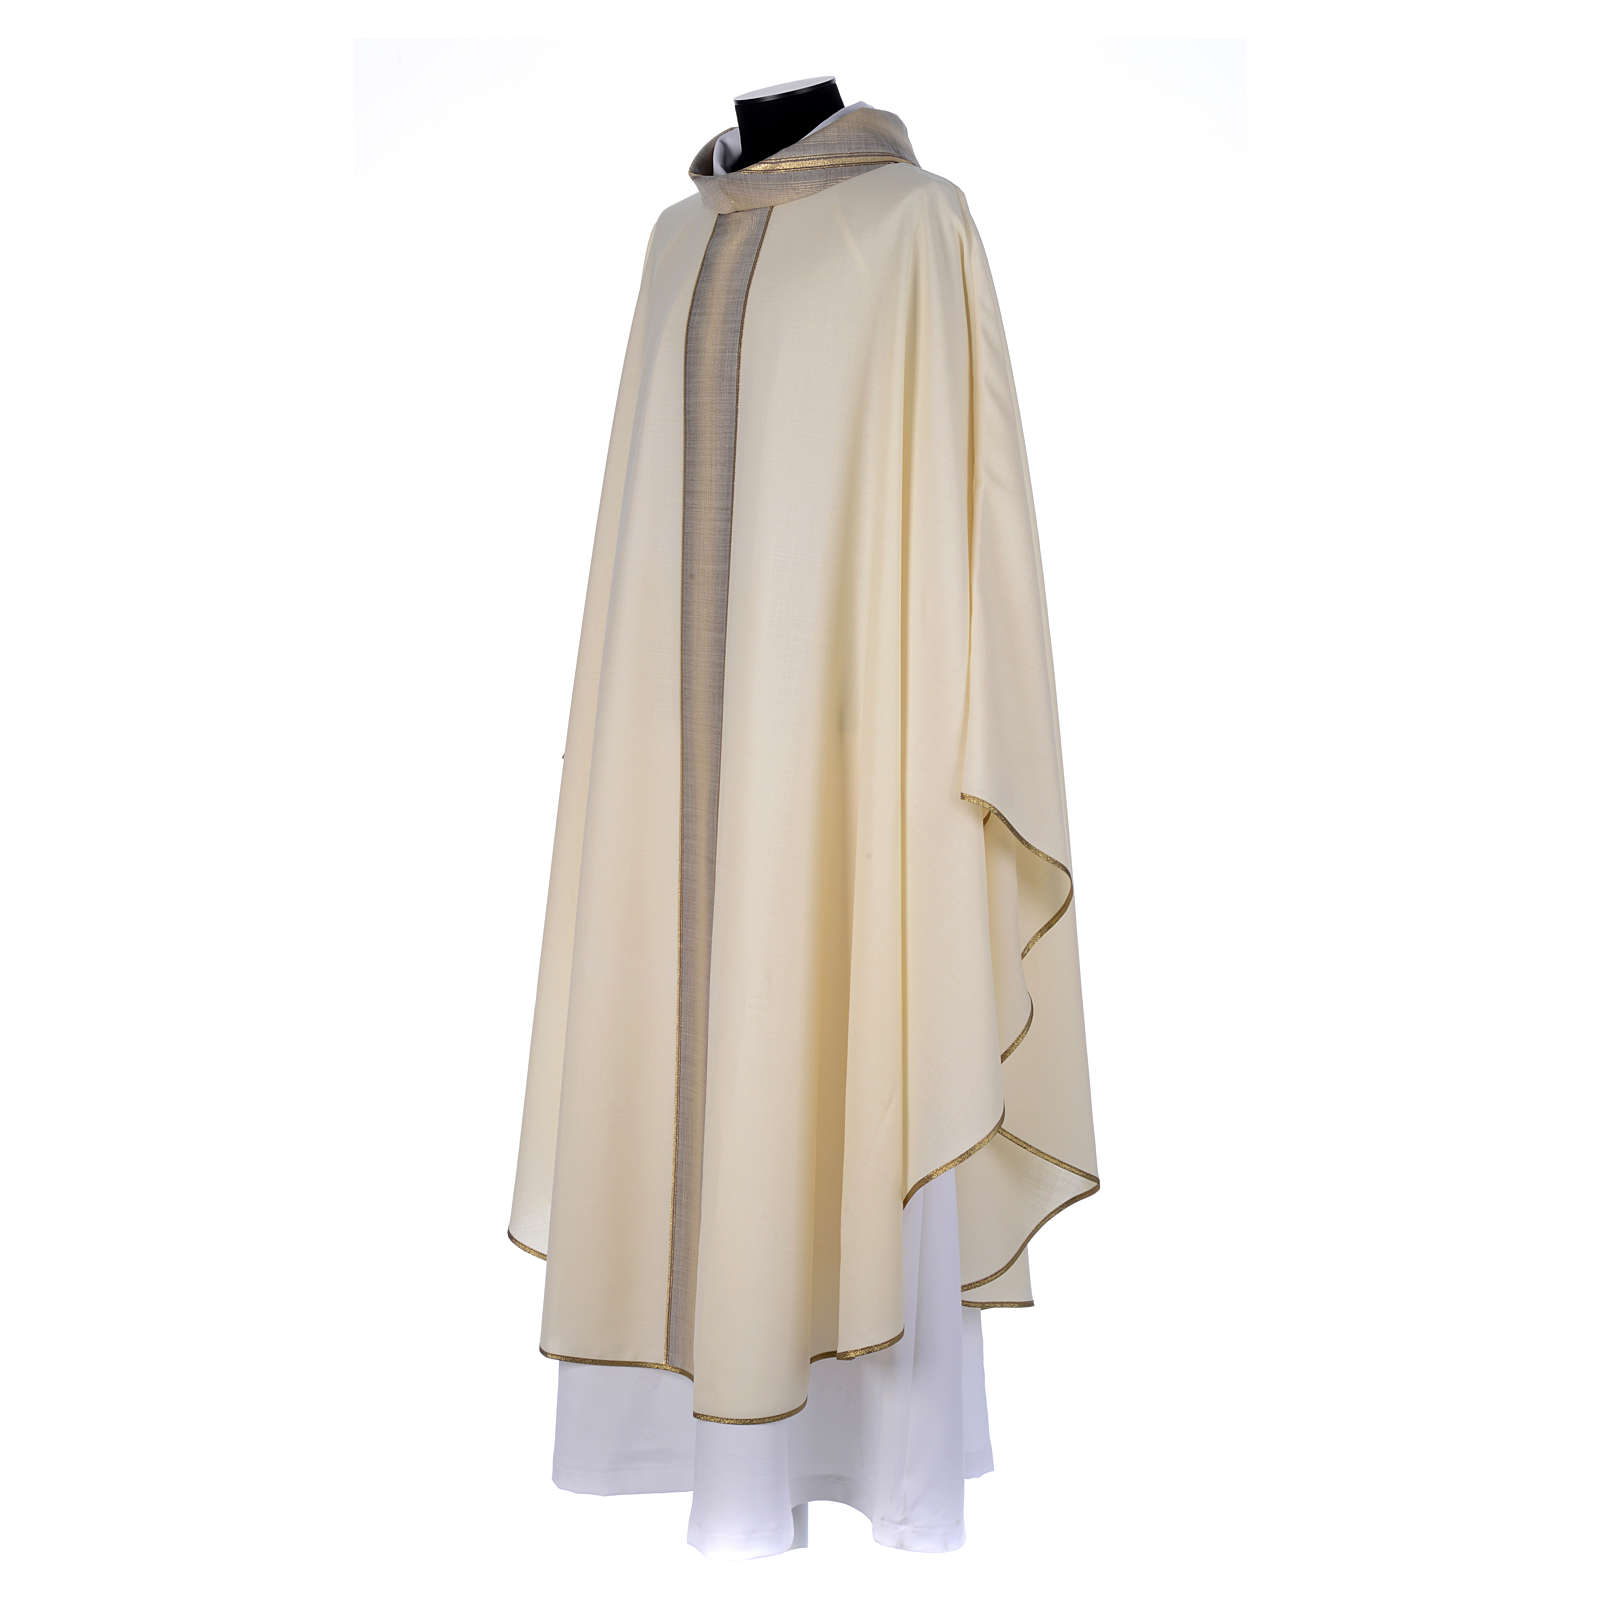 Casula em lã pura ultraleve 4